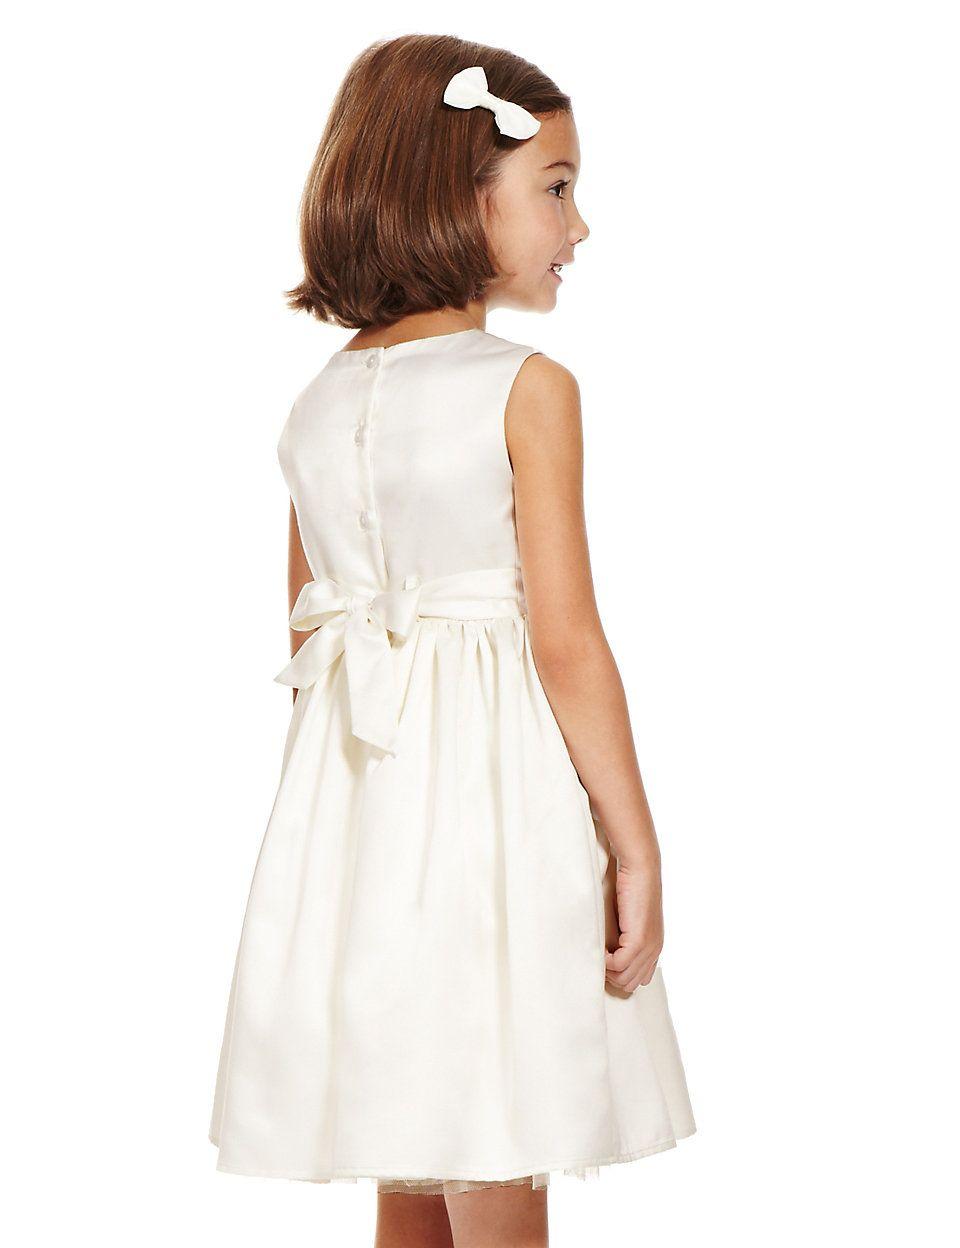 Sequin embellished belted bridesmaid dress ms flower girl flower girl dresses ombrellifo Gallery